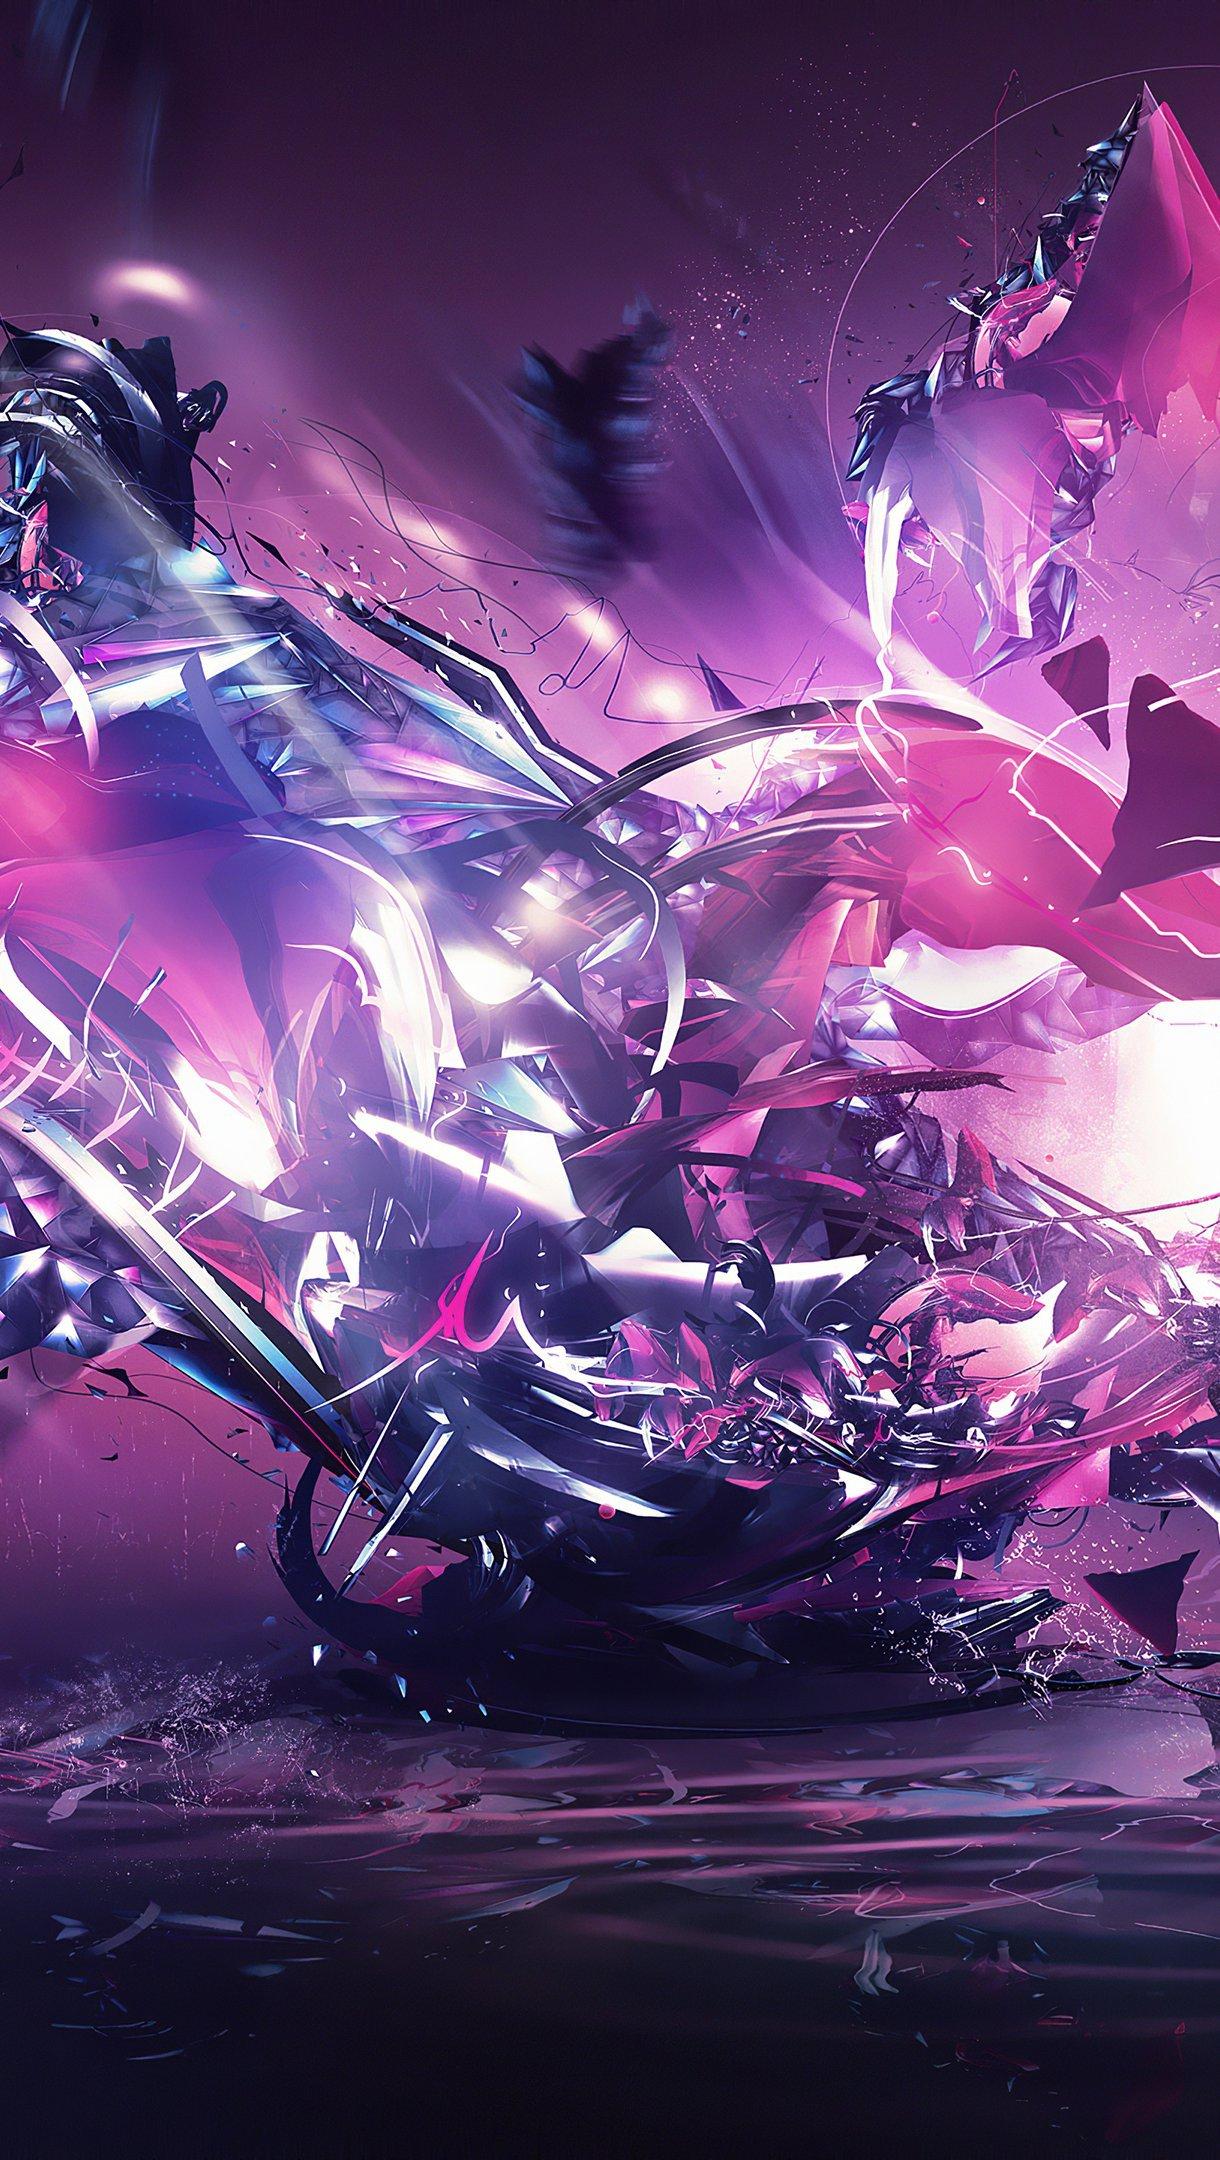 Wallpaper Destruction splash Vertical